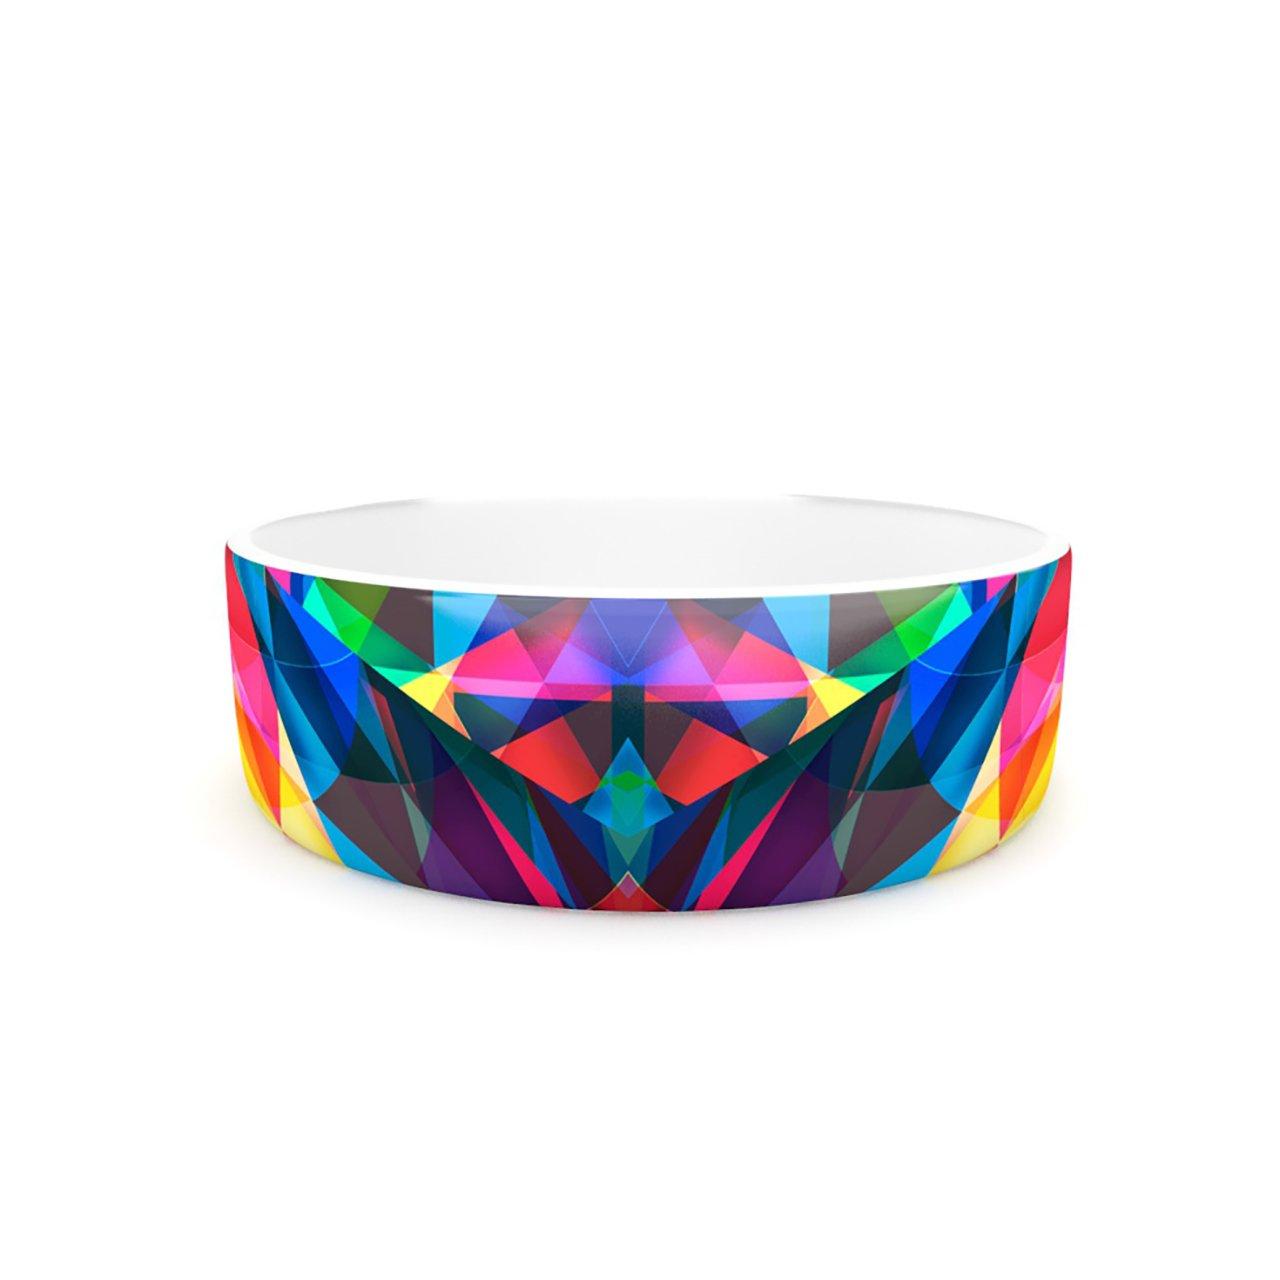 Kess InHouse Danny Ivan Day We Met  Pet Bowl, 7-Inch, Rainbow Geometric